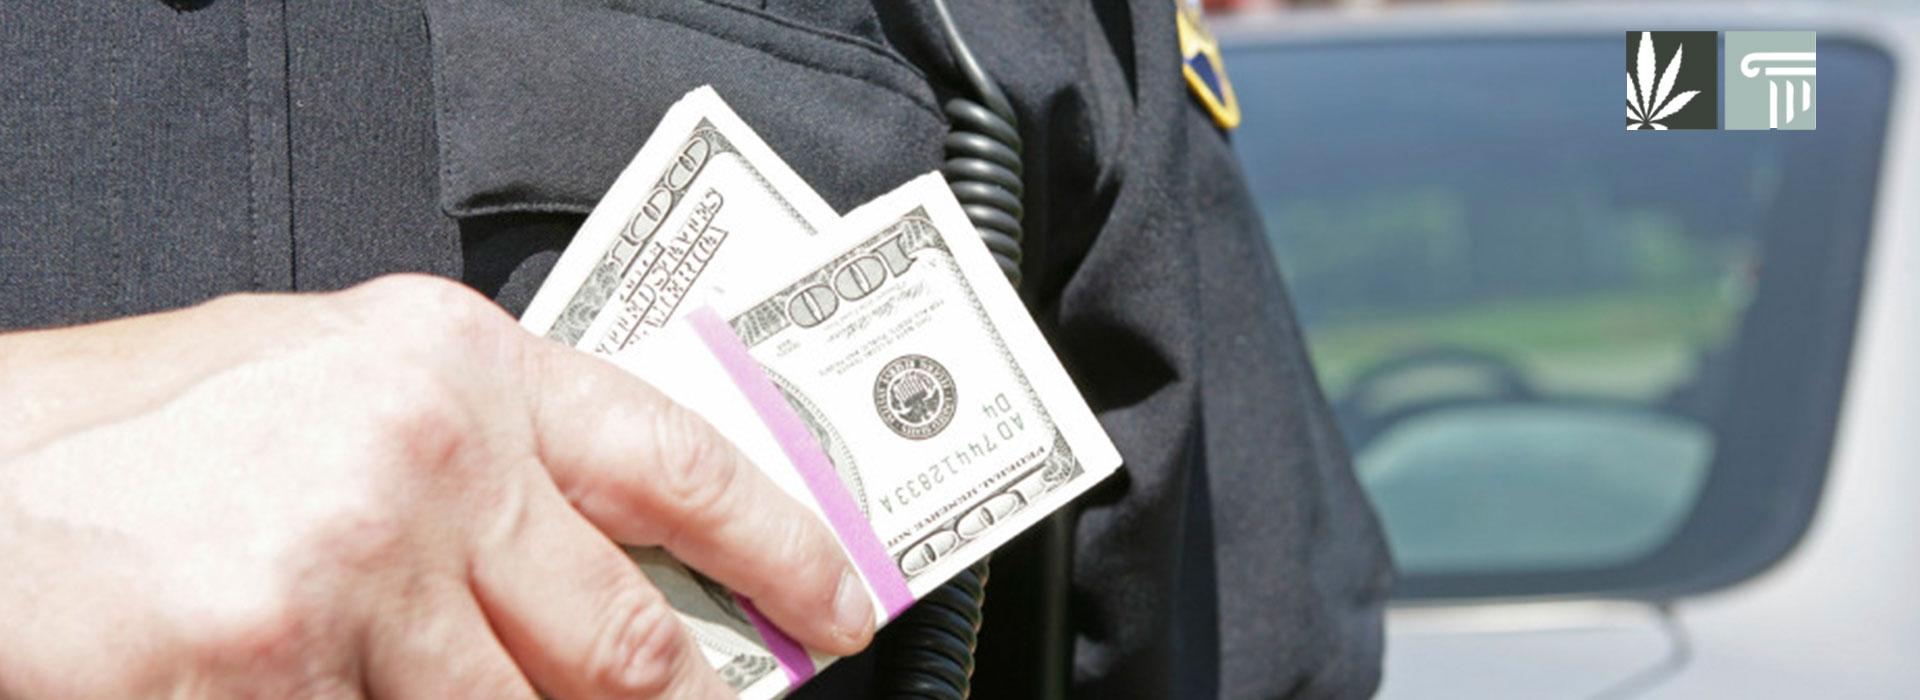 Brendon Jacy Tatum and Joseph Huffaker police Officers Extorting Motorists